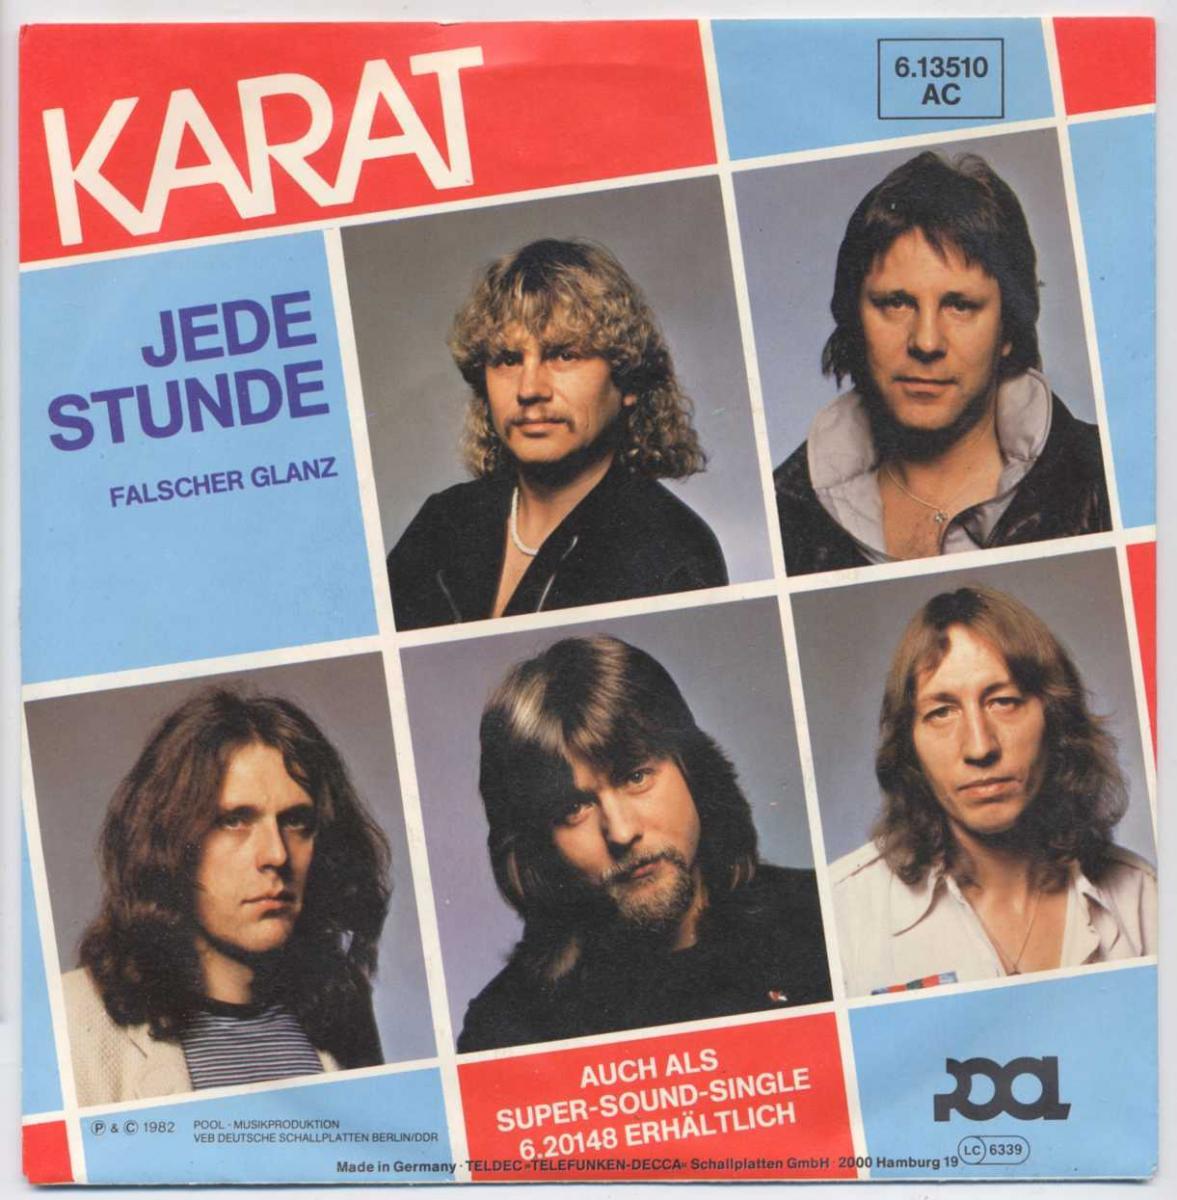 Vinyl-Single: <b><br>Karat: <br>Jede Stunde / Falscher Glanz </b><br>Pool 6.13510 AC, (P) 1982